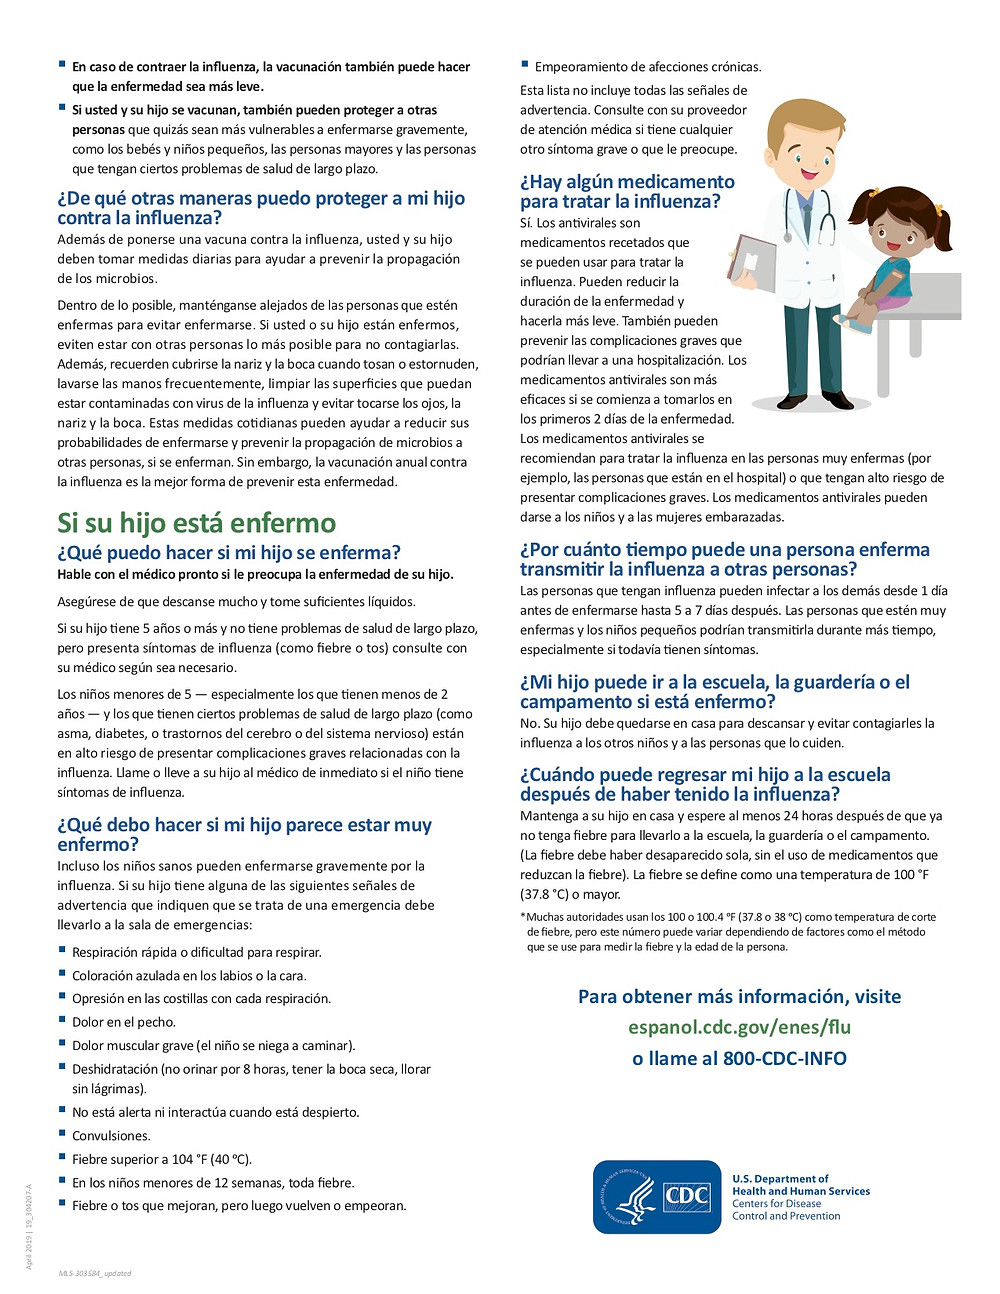 Flu information page 2 en Espanol